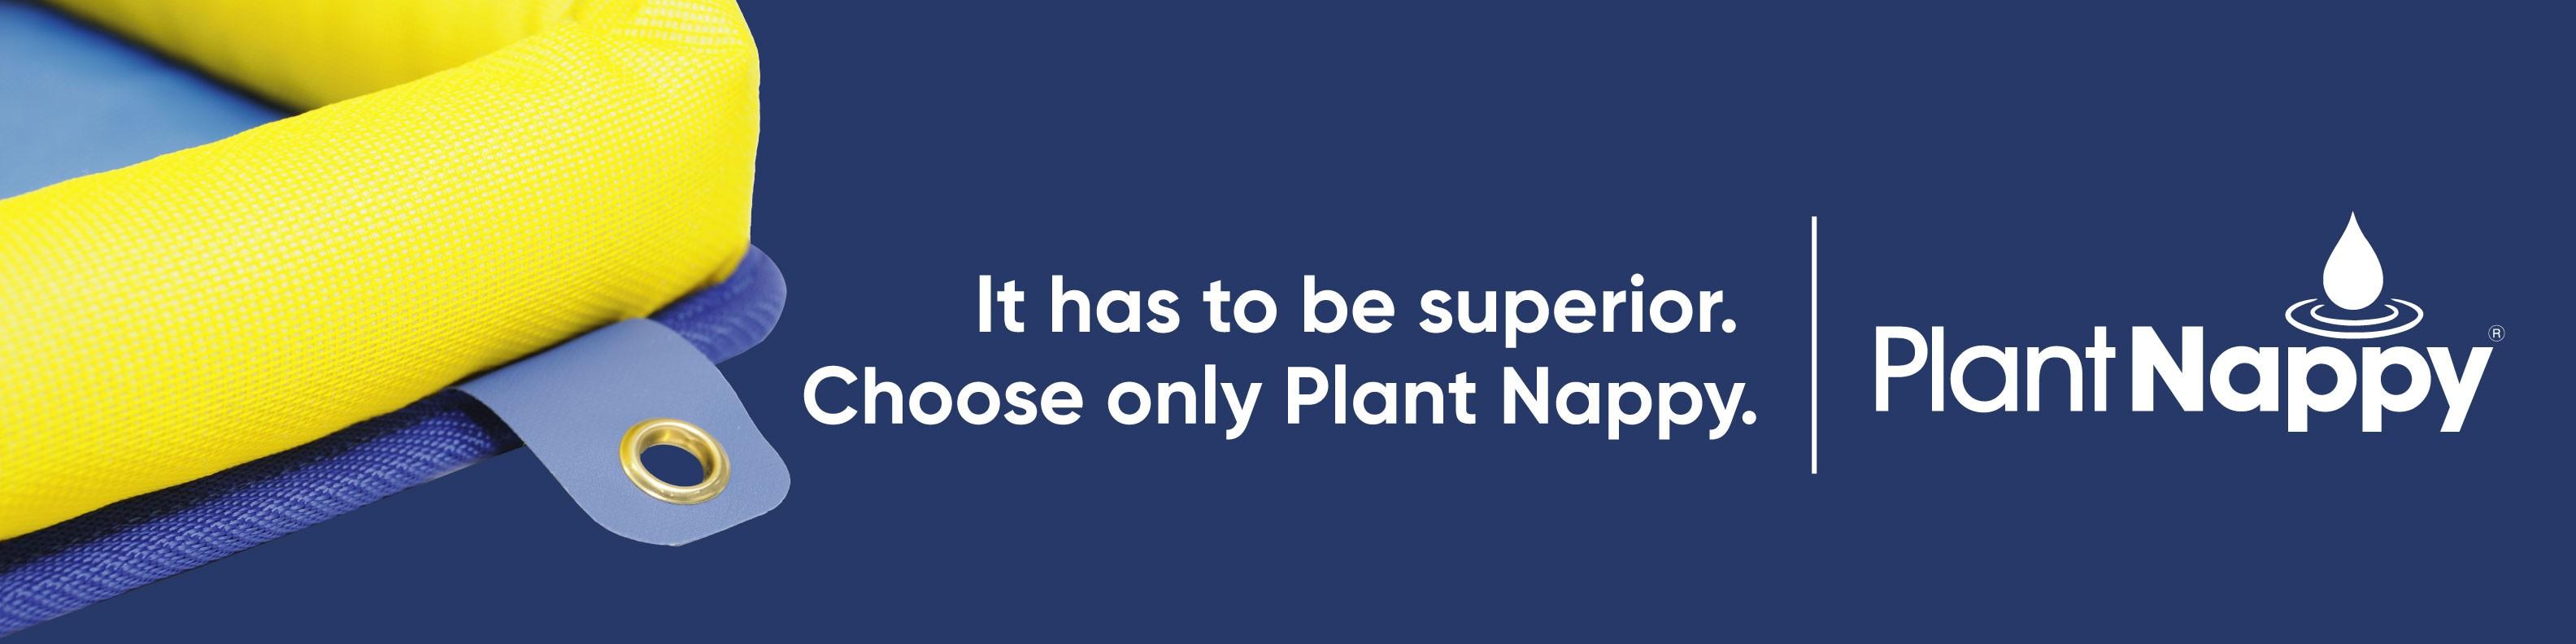 Plant Nappy